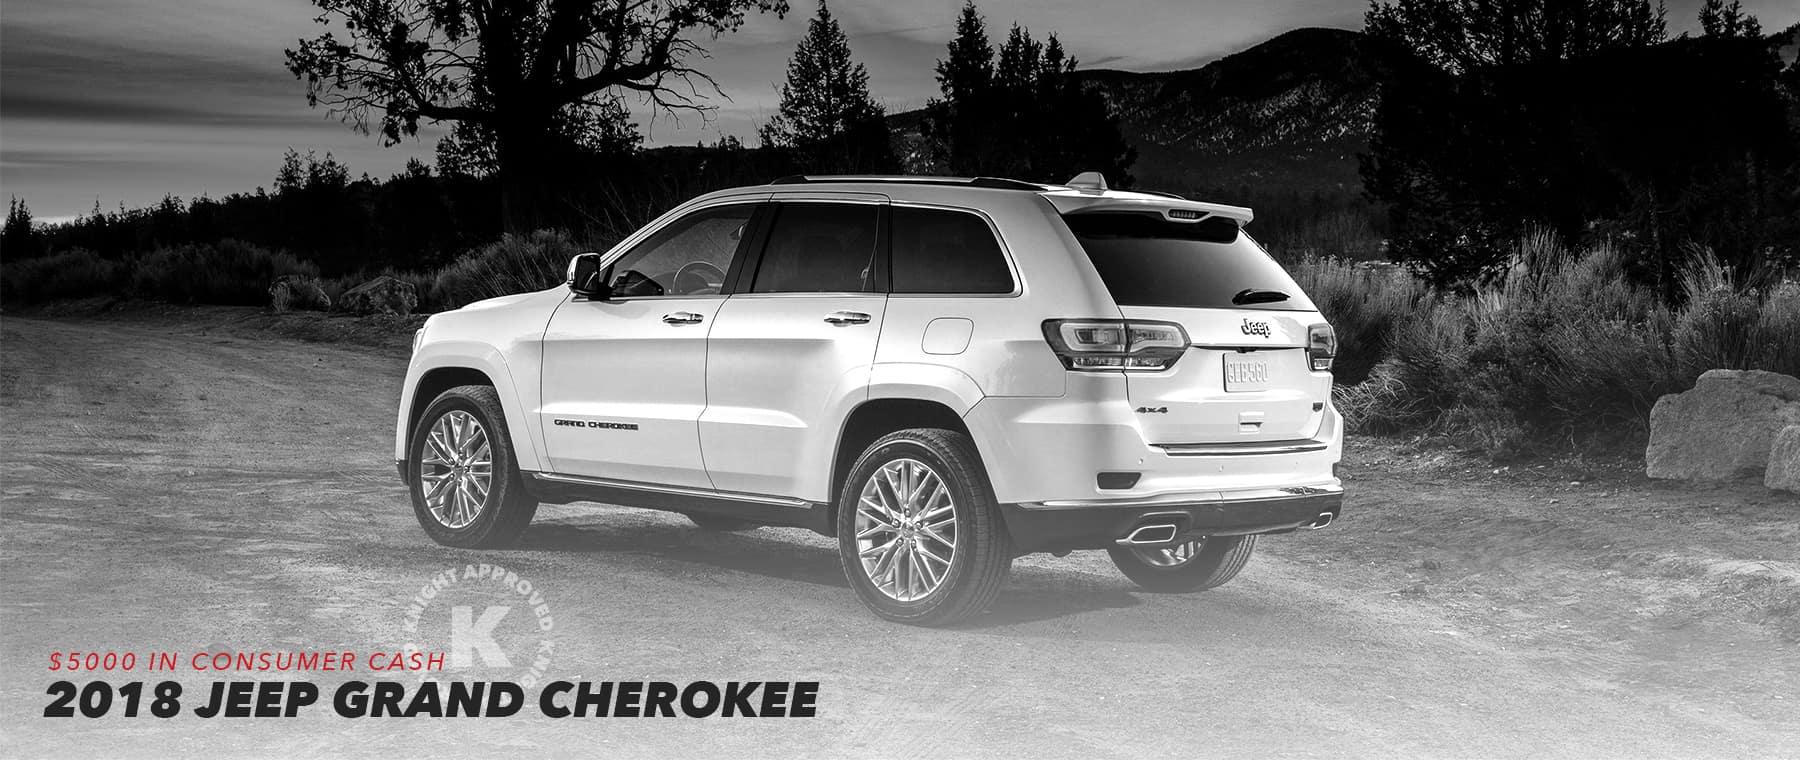 2018 Jeep Grand Cherokee Homepage Slider